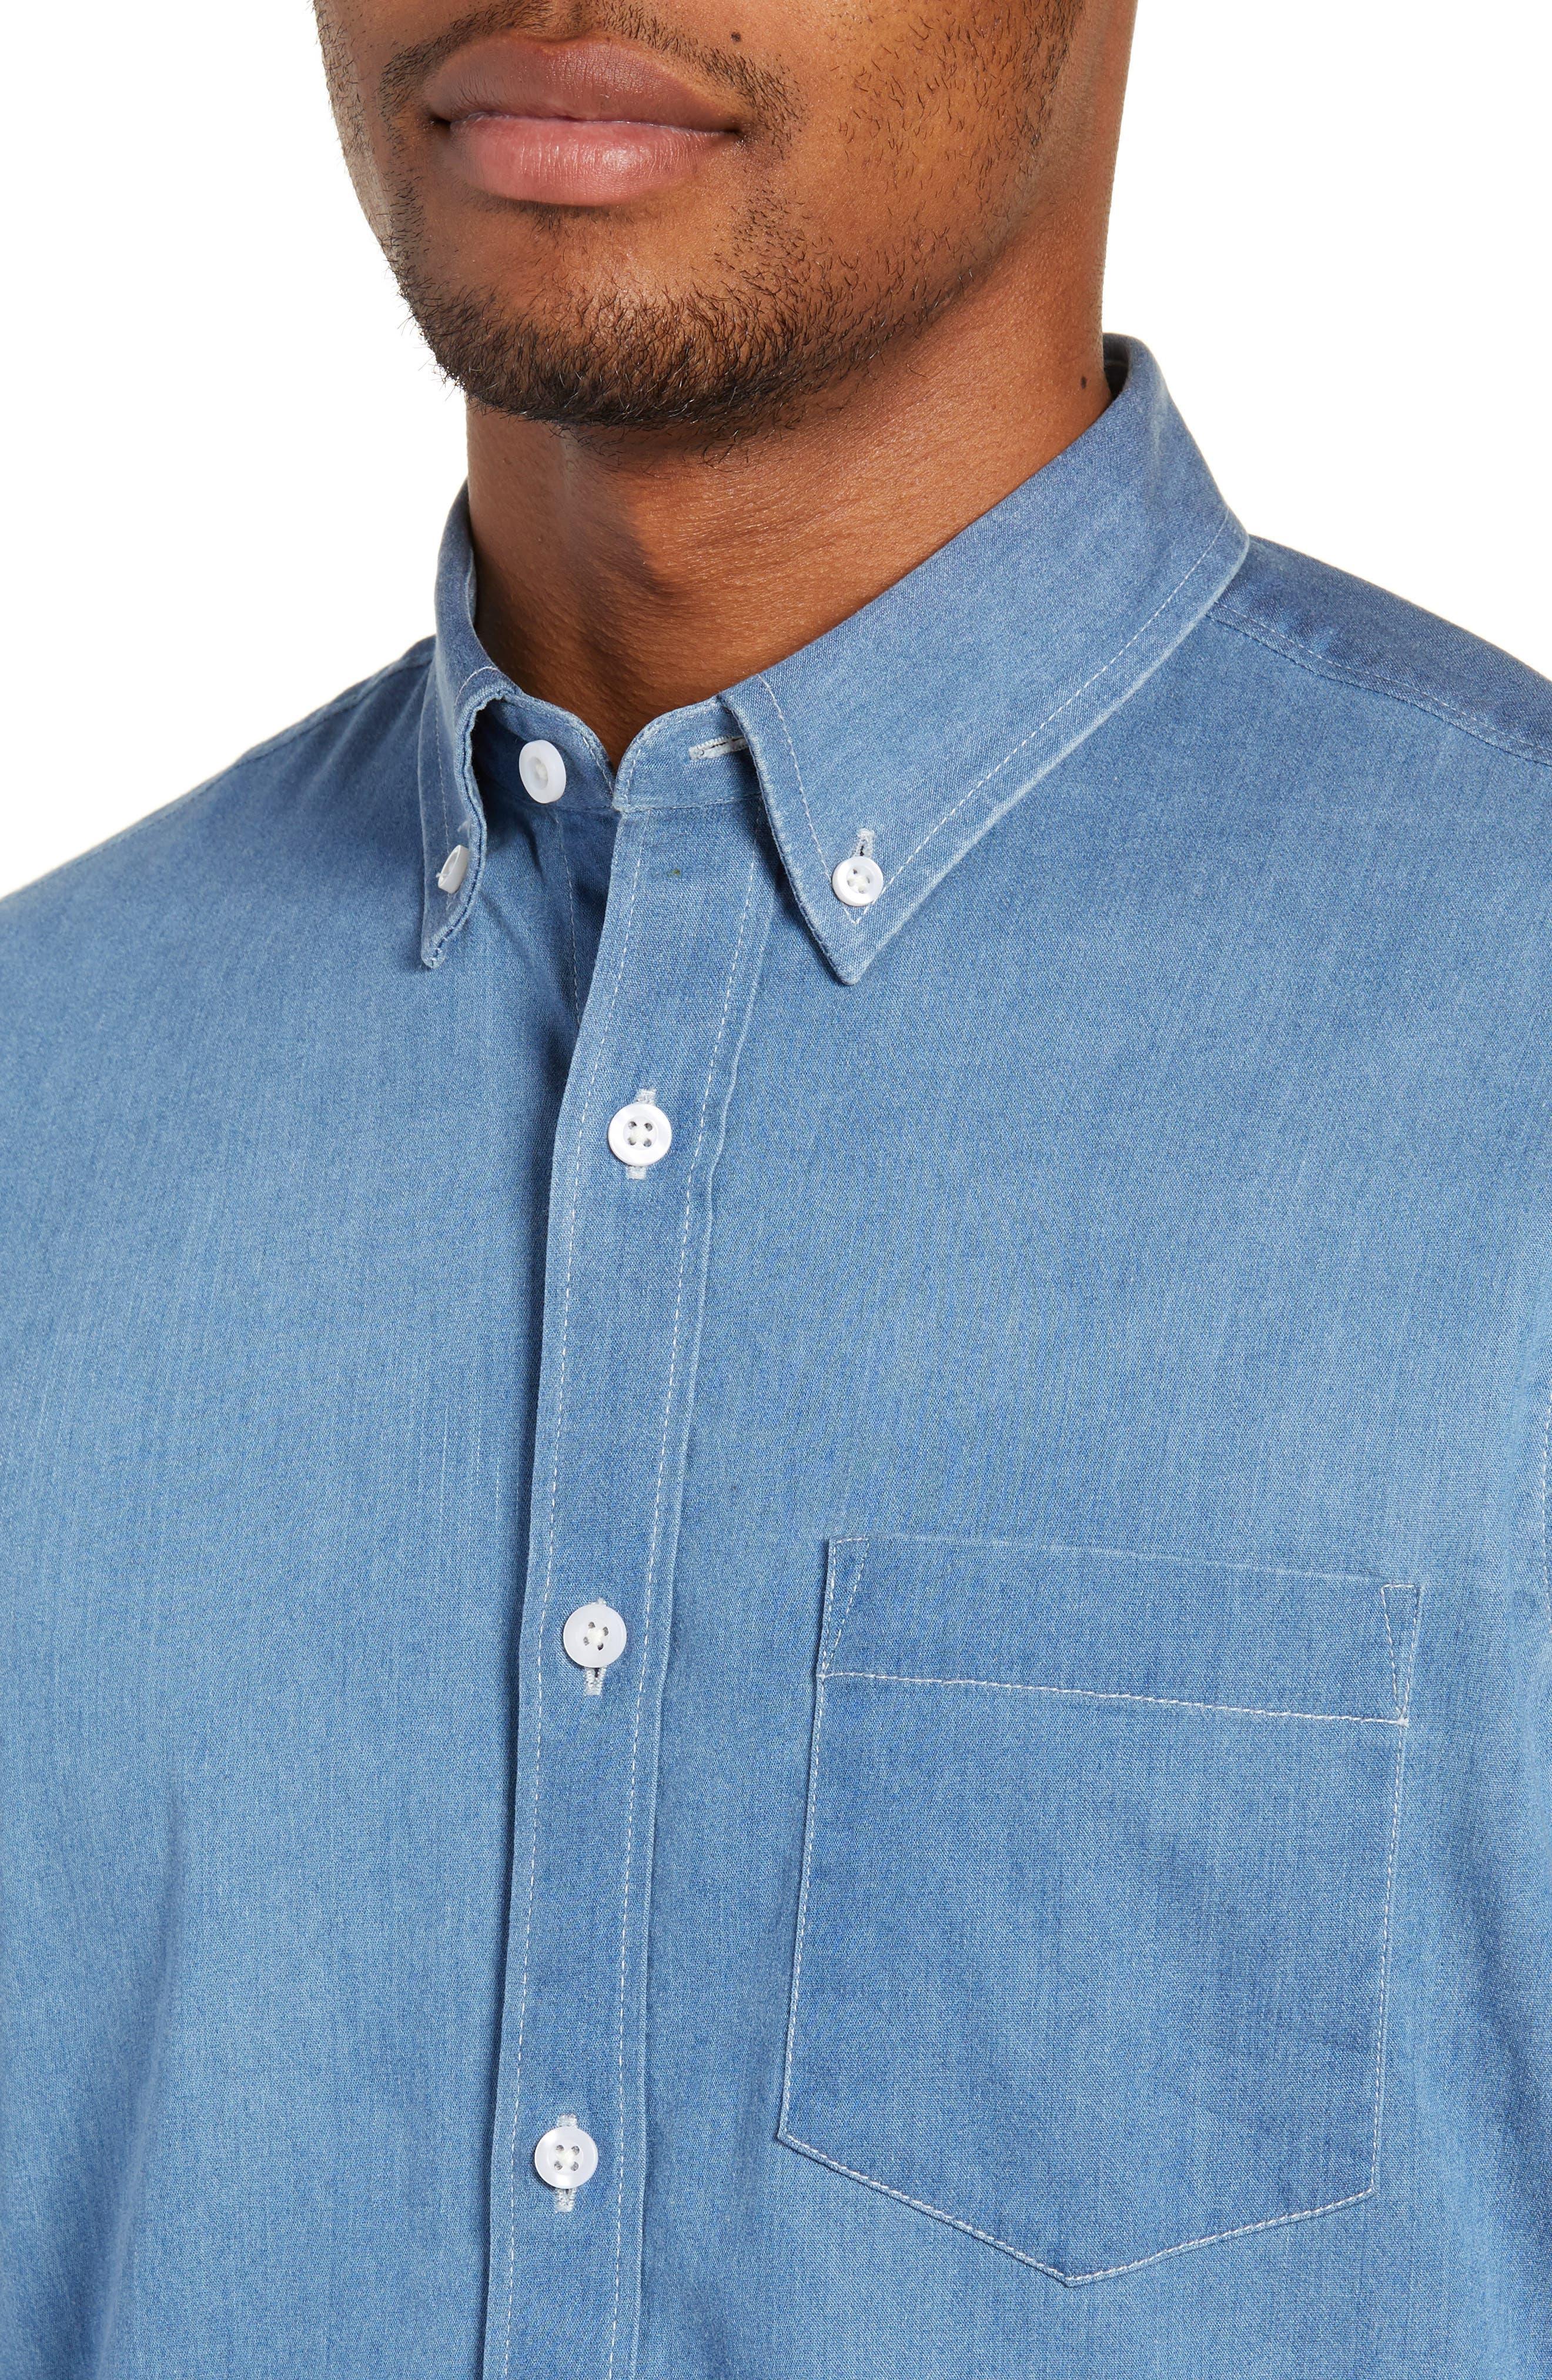 Slim Fit Chambray Sport Shirt,                             Alternate thumbnail 2, color,                             BLUE HEAVEN CHAMBRAY